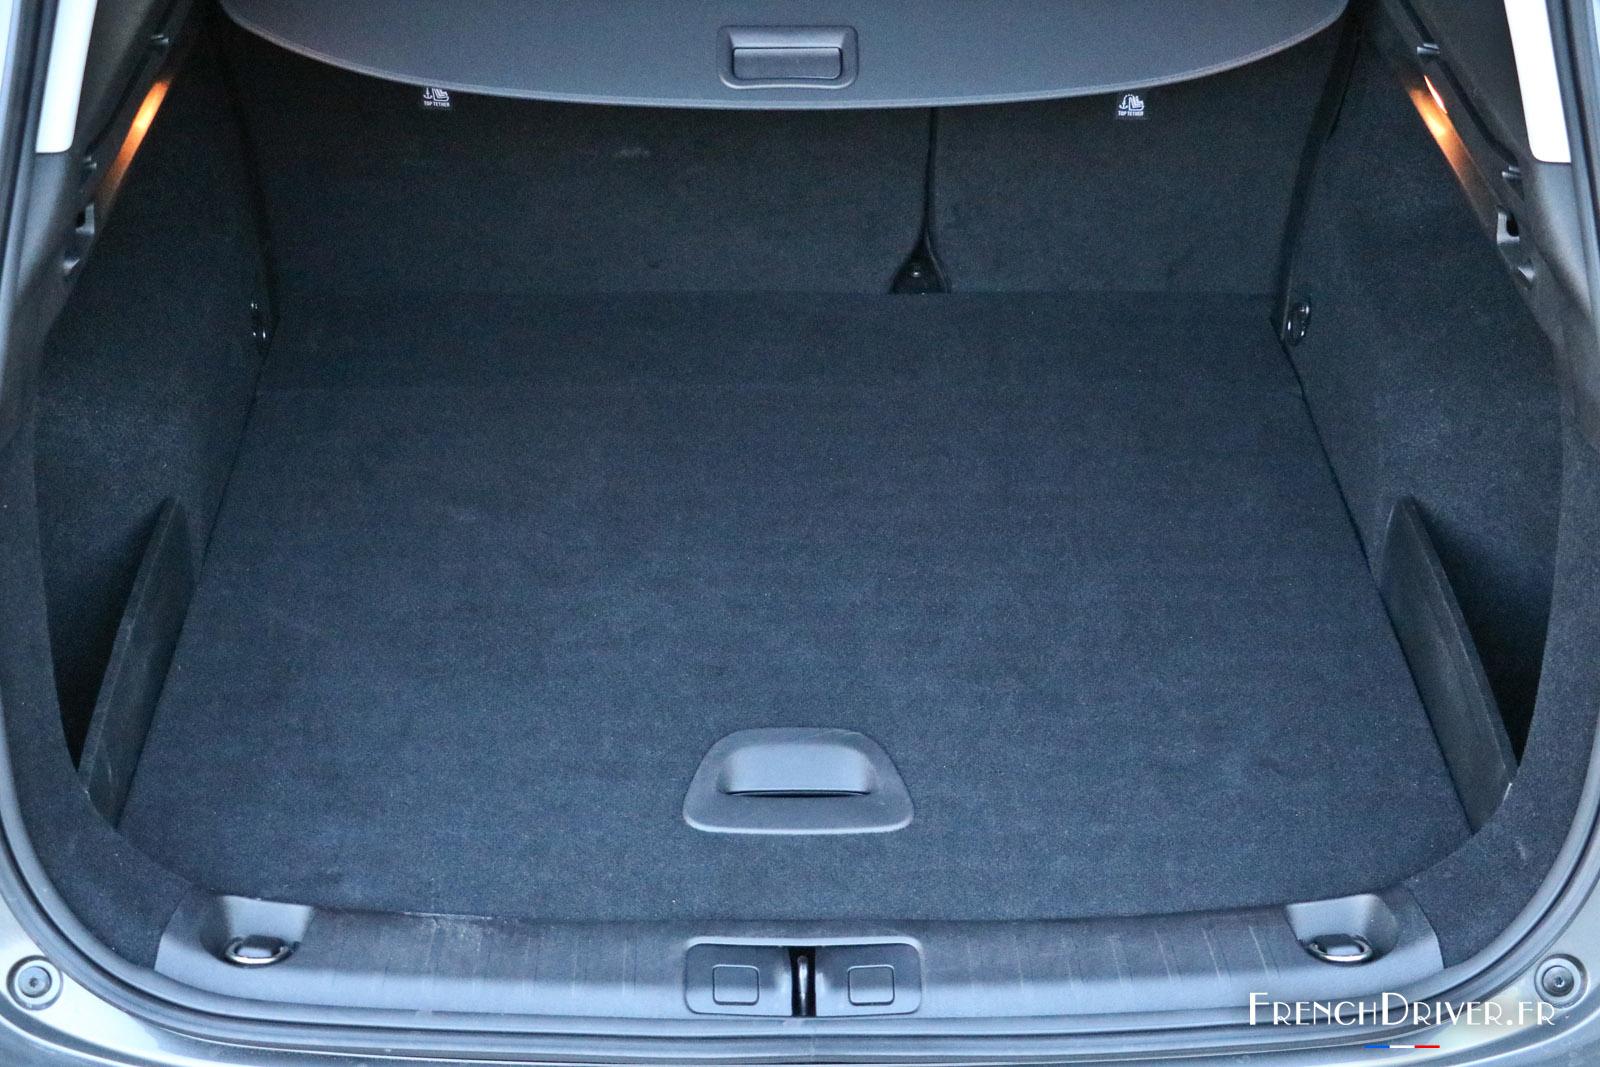 essai fiat tipo station wagon la famille s 39 agrandit french driver. Black Bedroom Furniture Sets. Home Design Ideas